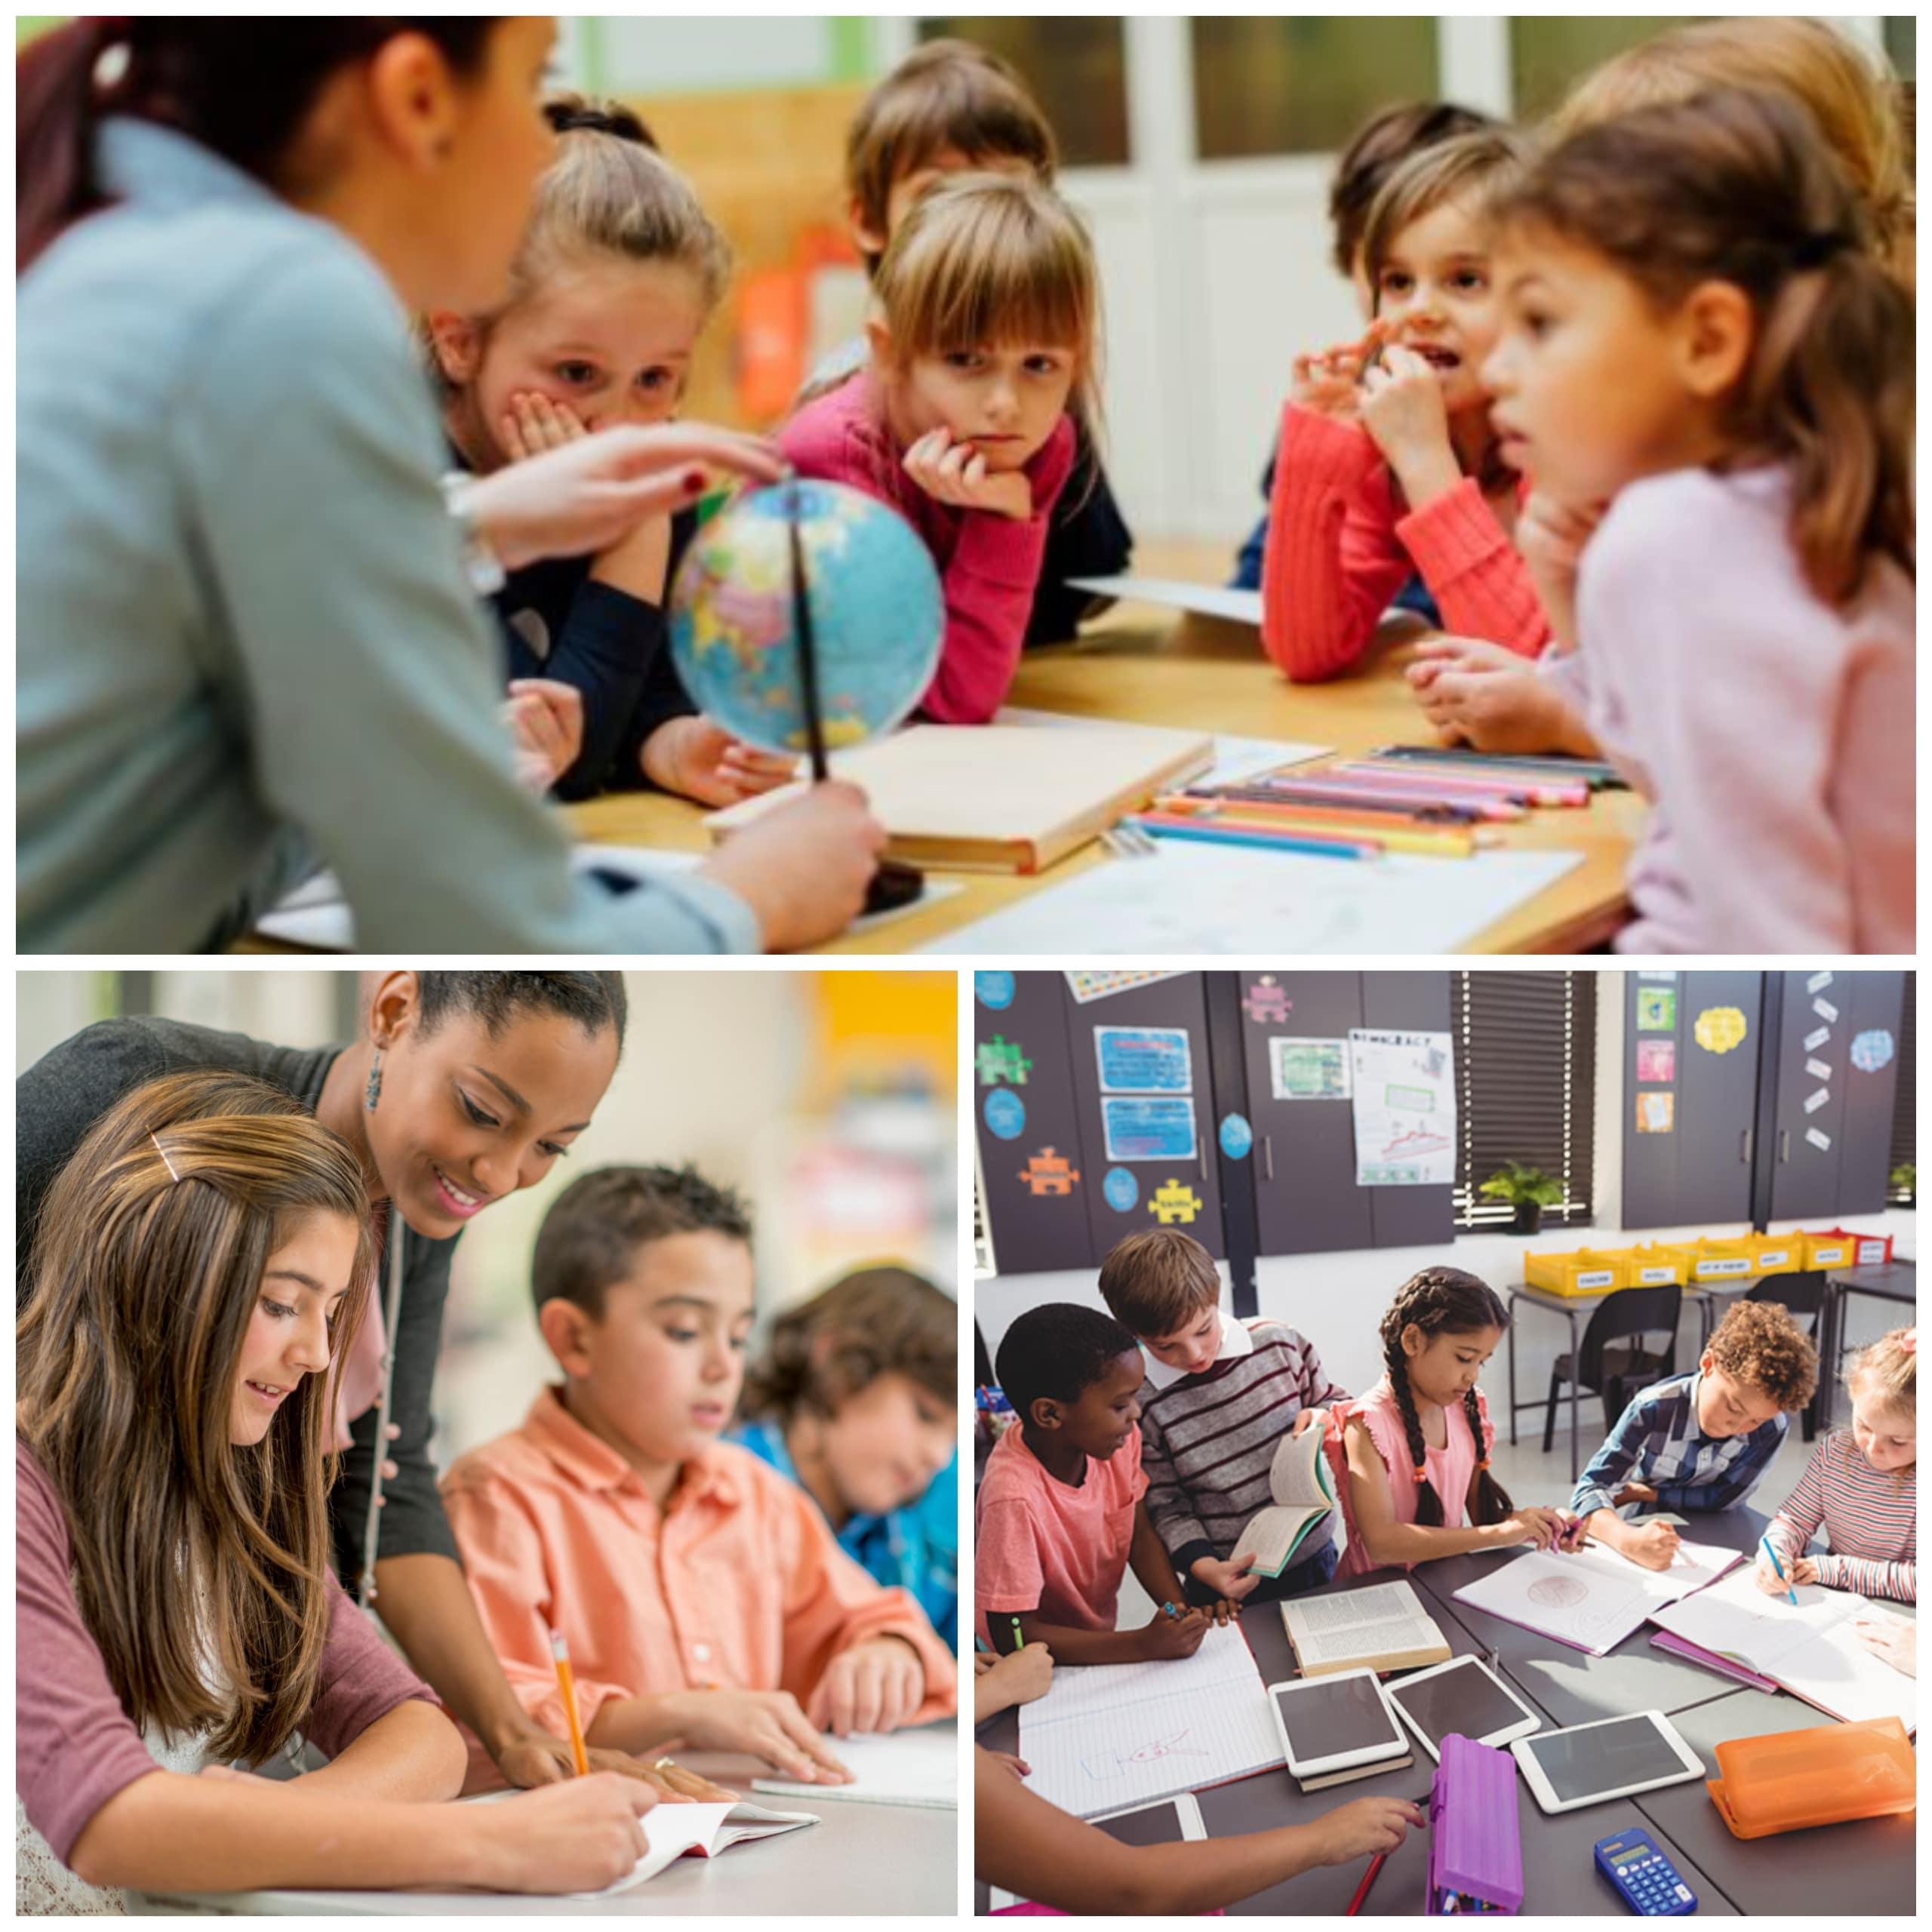 5 Reasons to Love Teaching!